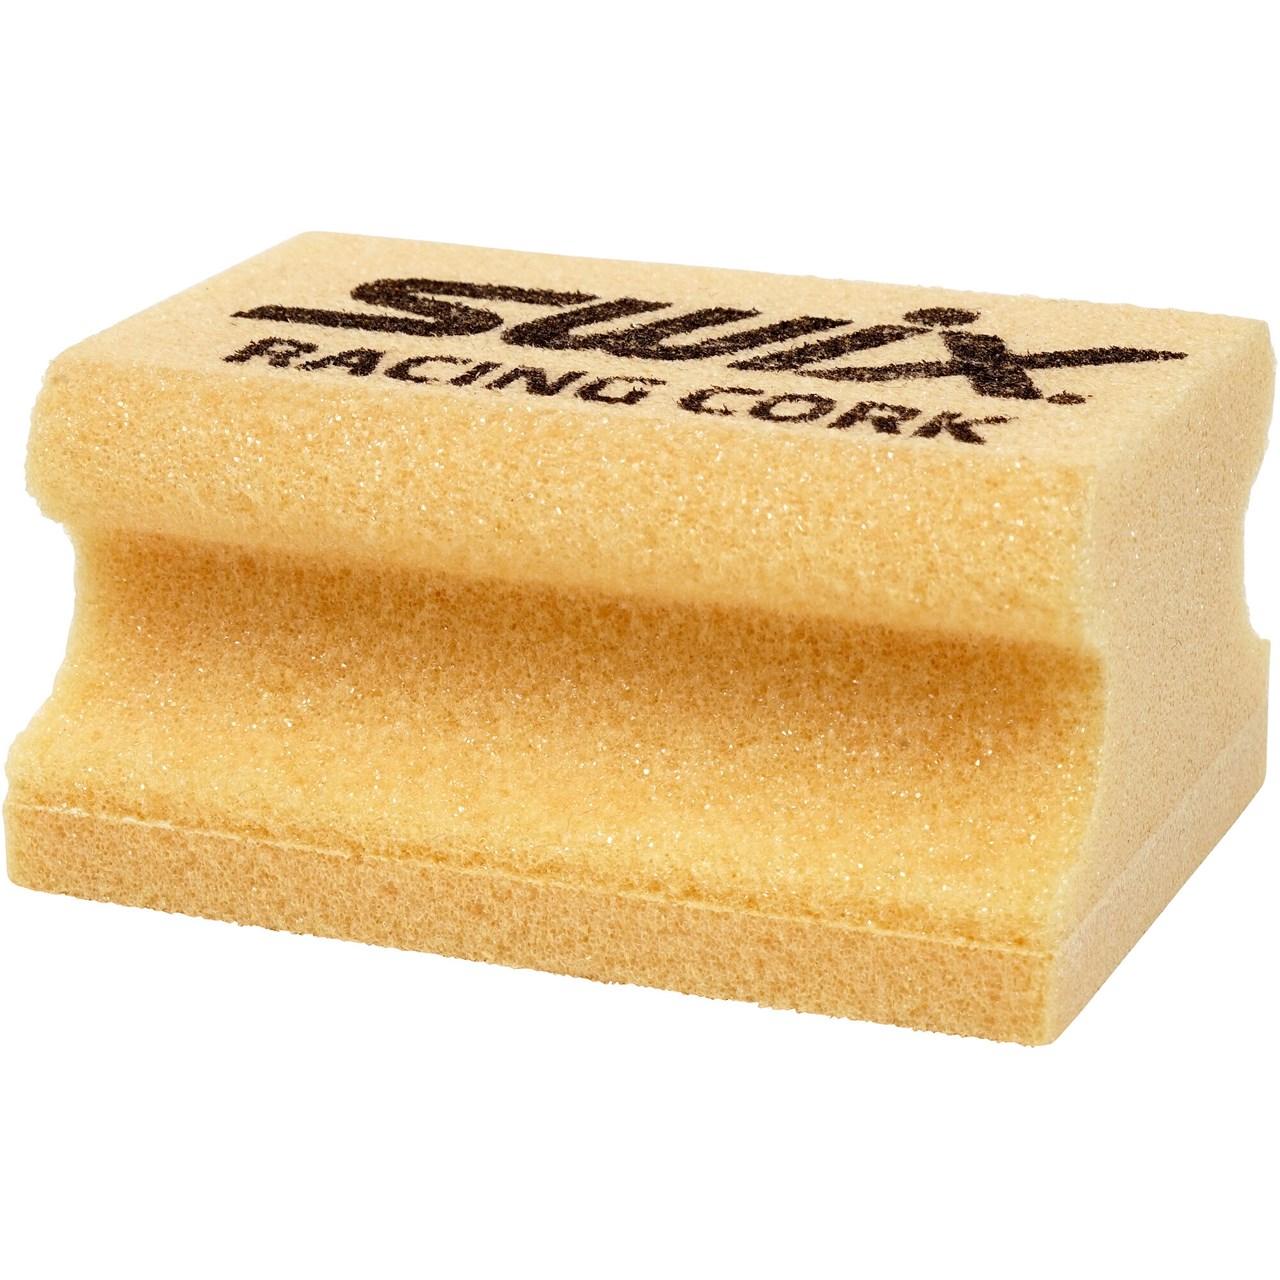 T12 synthetic racing cork